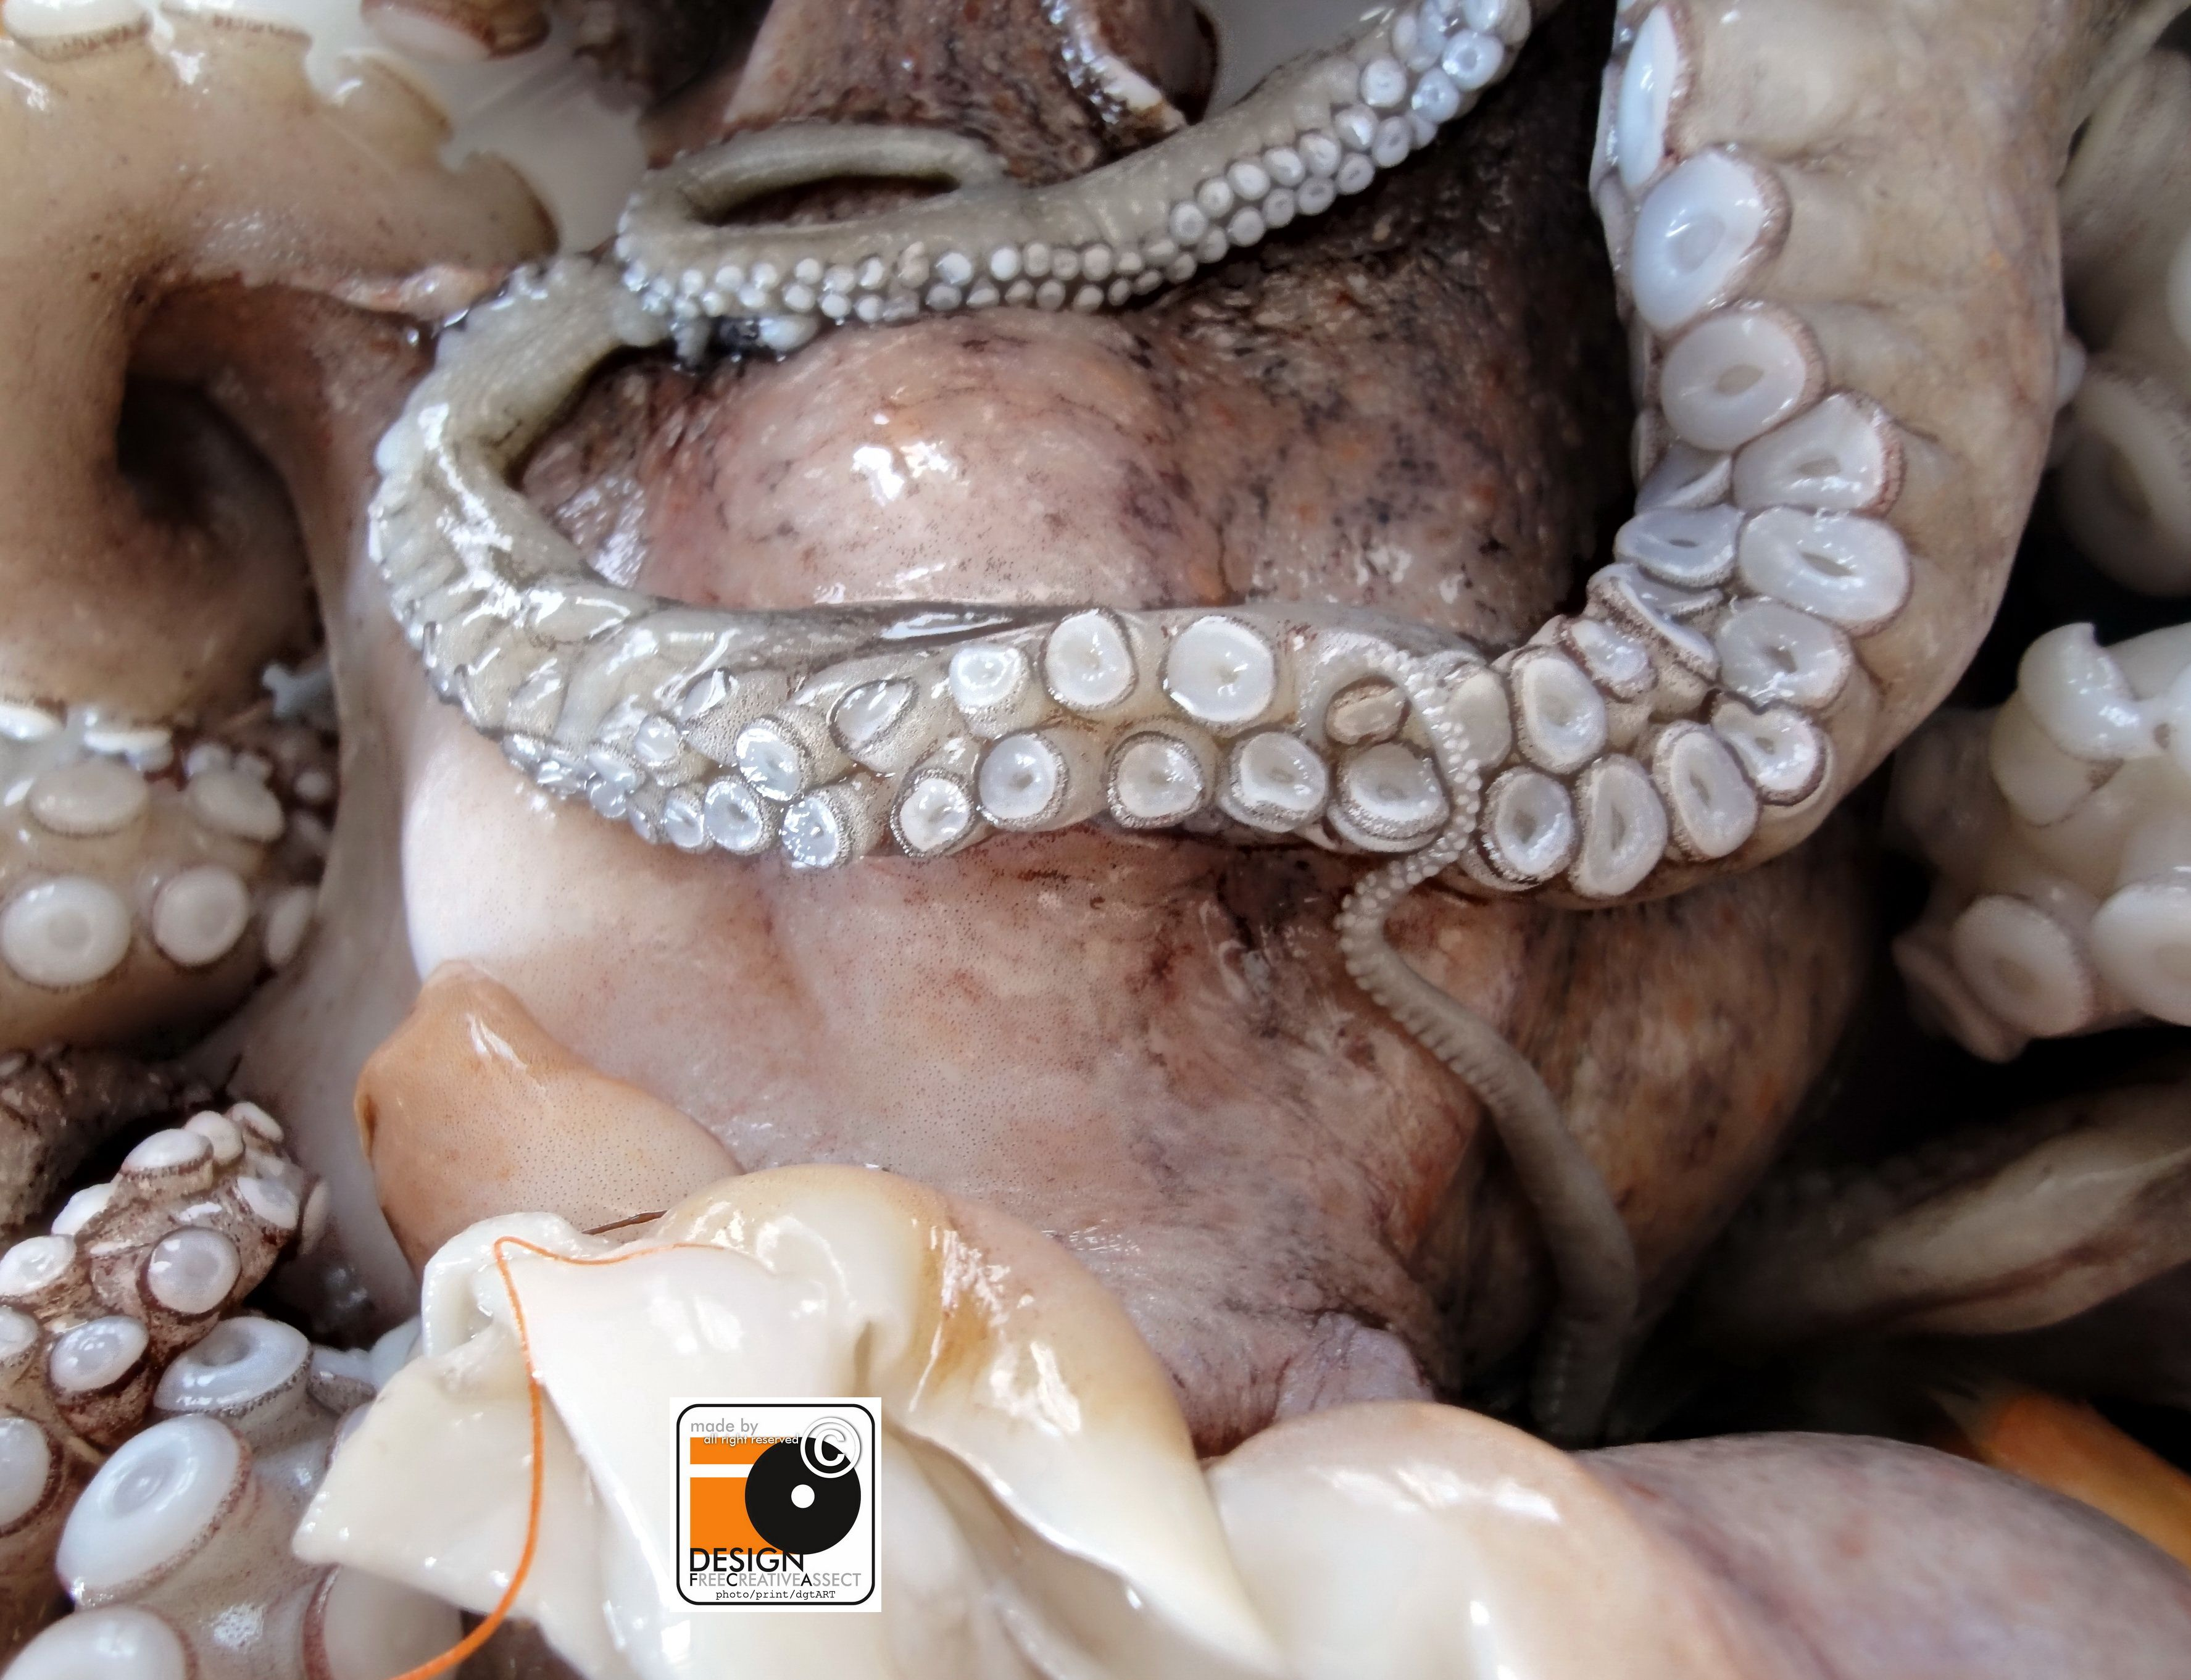 operation octopus